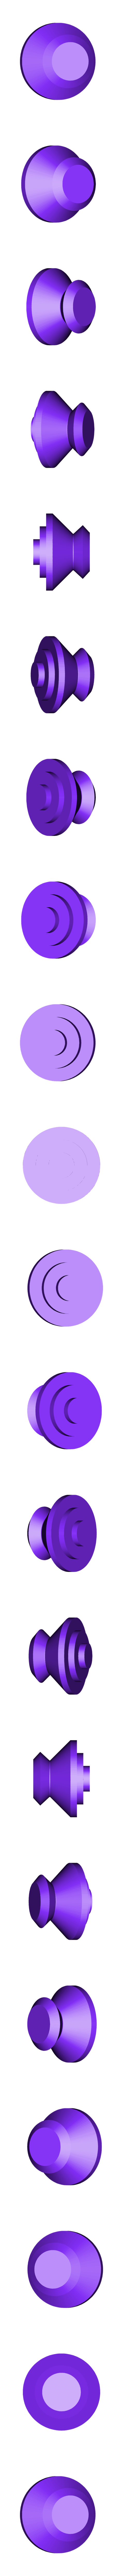 Target Charm.stl Download free STL file Charm Ring • 3D printable model, Lucy_Haribert